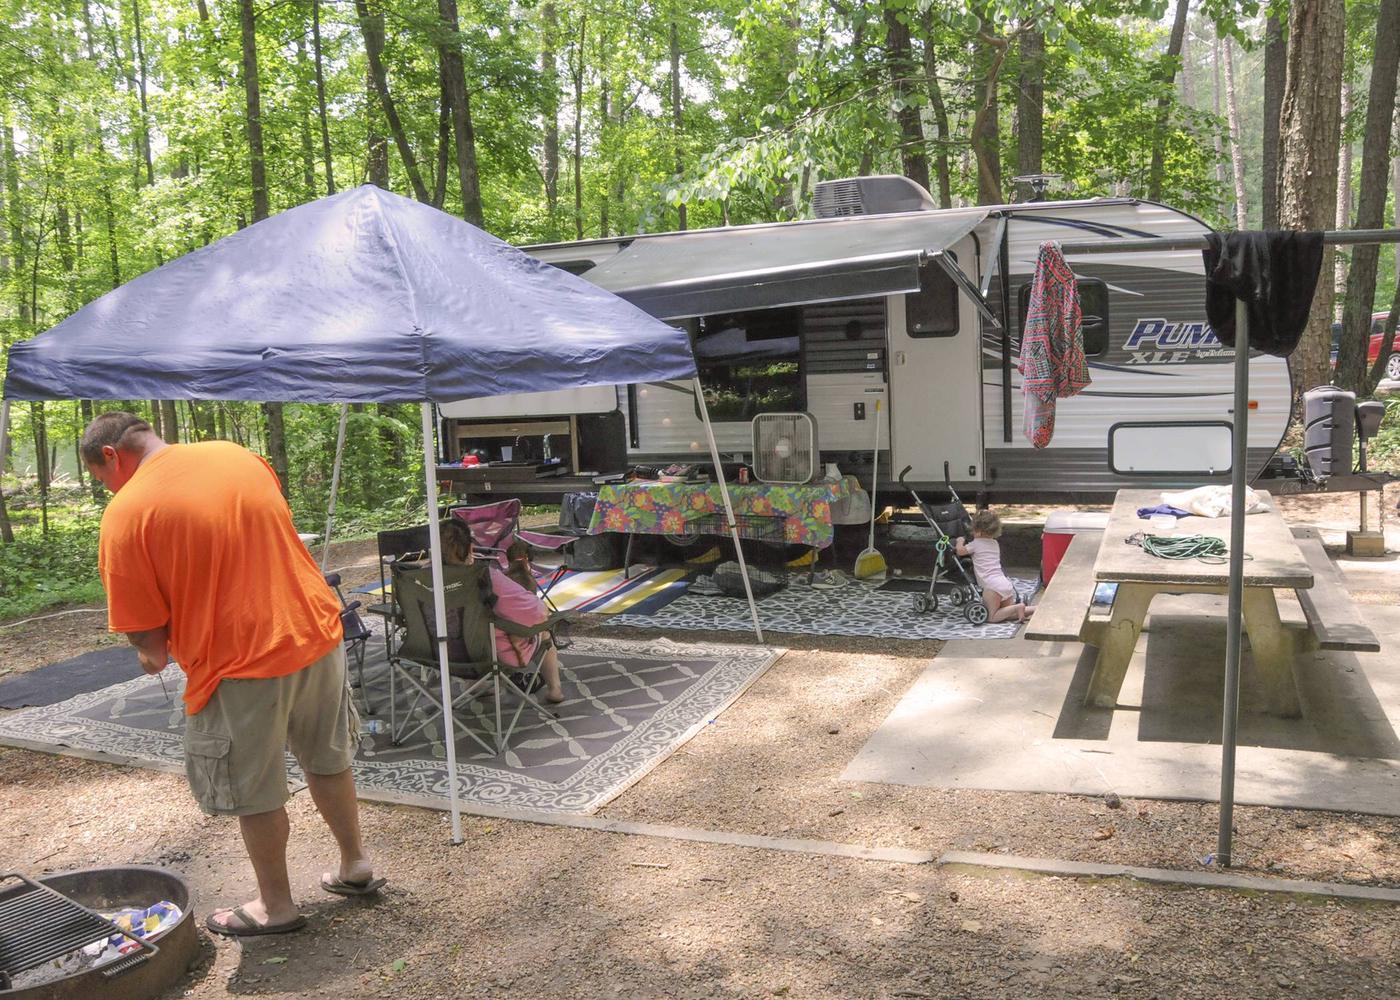 Campsite view.McKaskey Creek Campground, campsite 47.